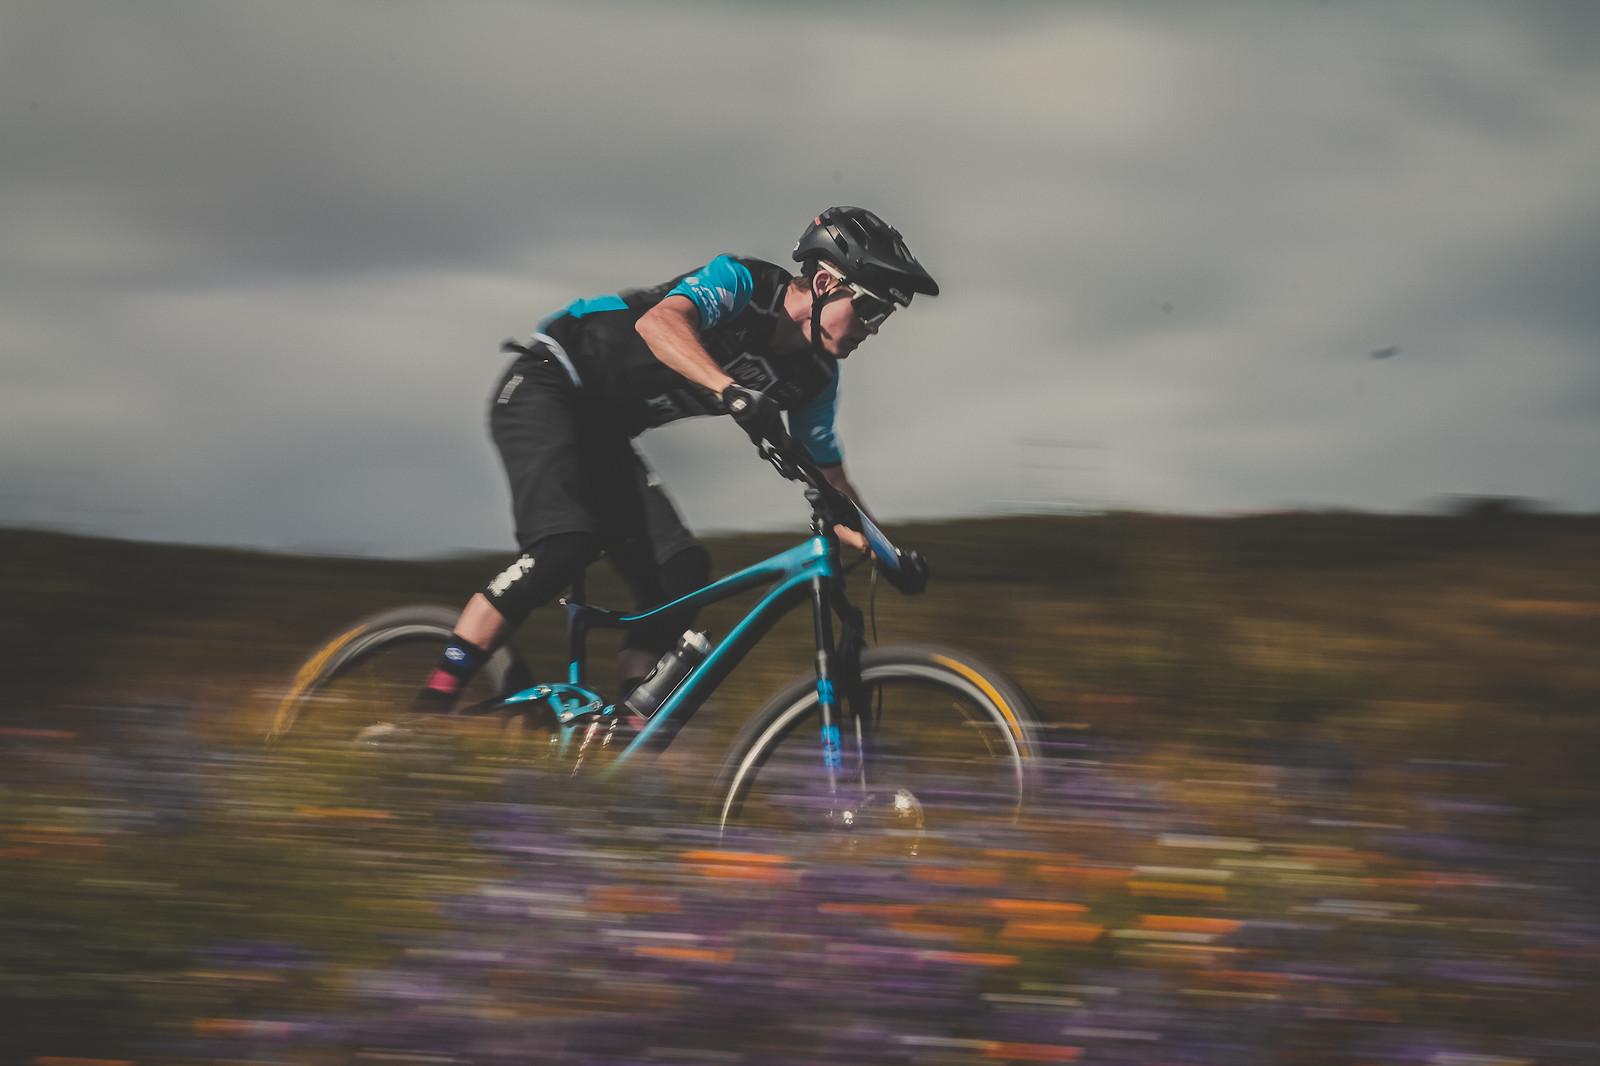 IMG 2089 - Liam Donohue - Mountain Biking Pictures - Vital MTB